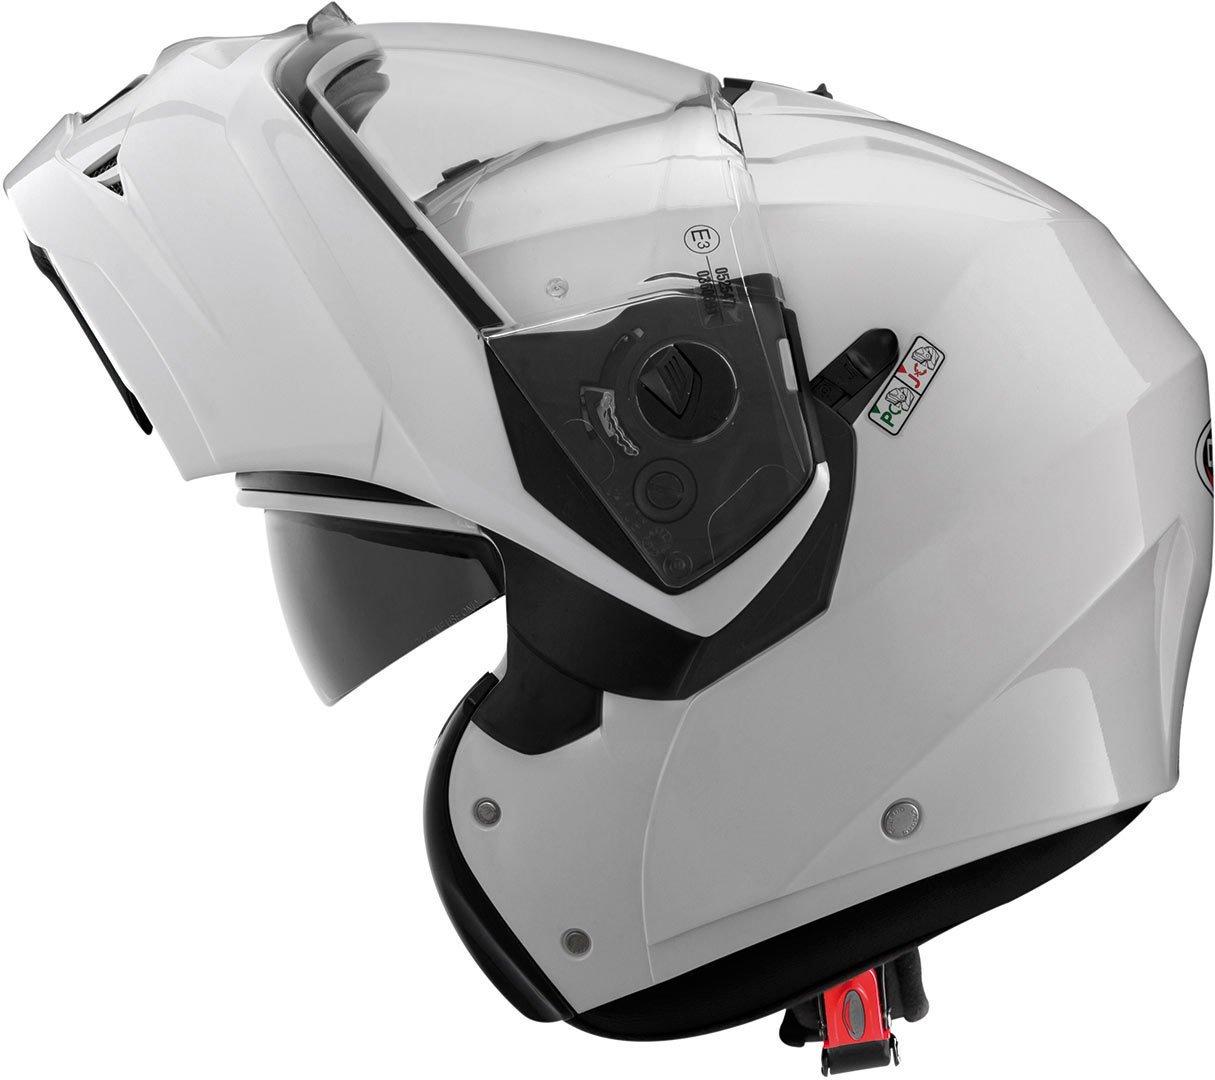 59//60 cm Caberg Klapp Helm Duke II 2 Wei/ß Metallic Motorrad Sonnenblende Pinlock Jet 2205 C0IA00A5 Gr/ö/ße L